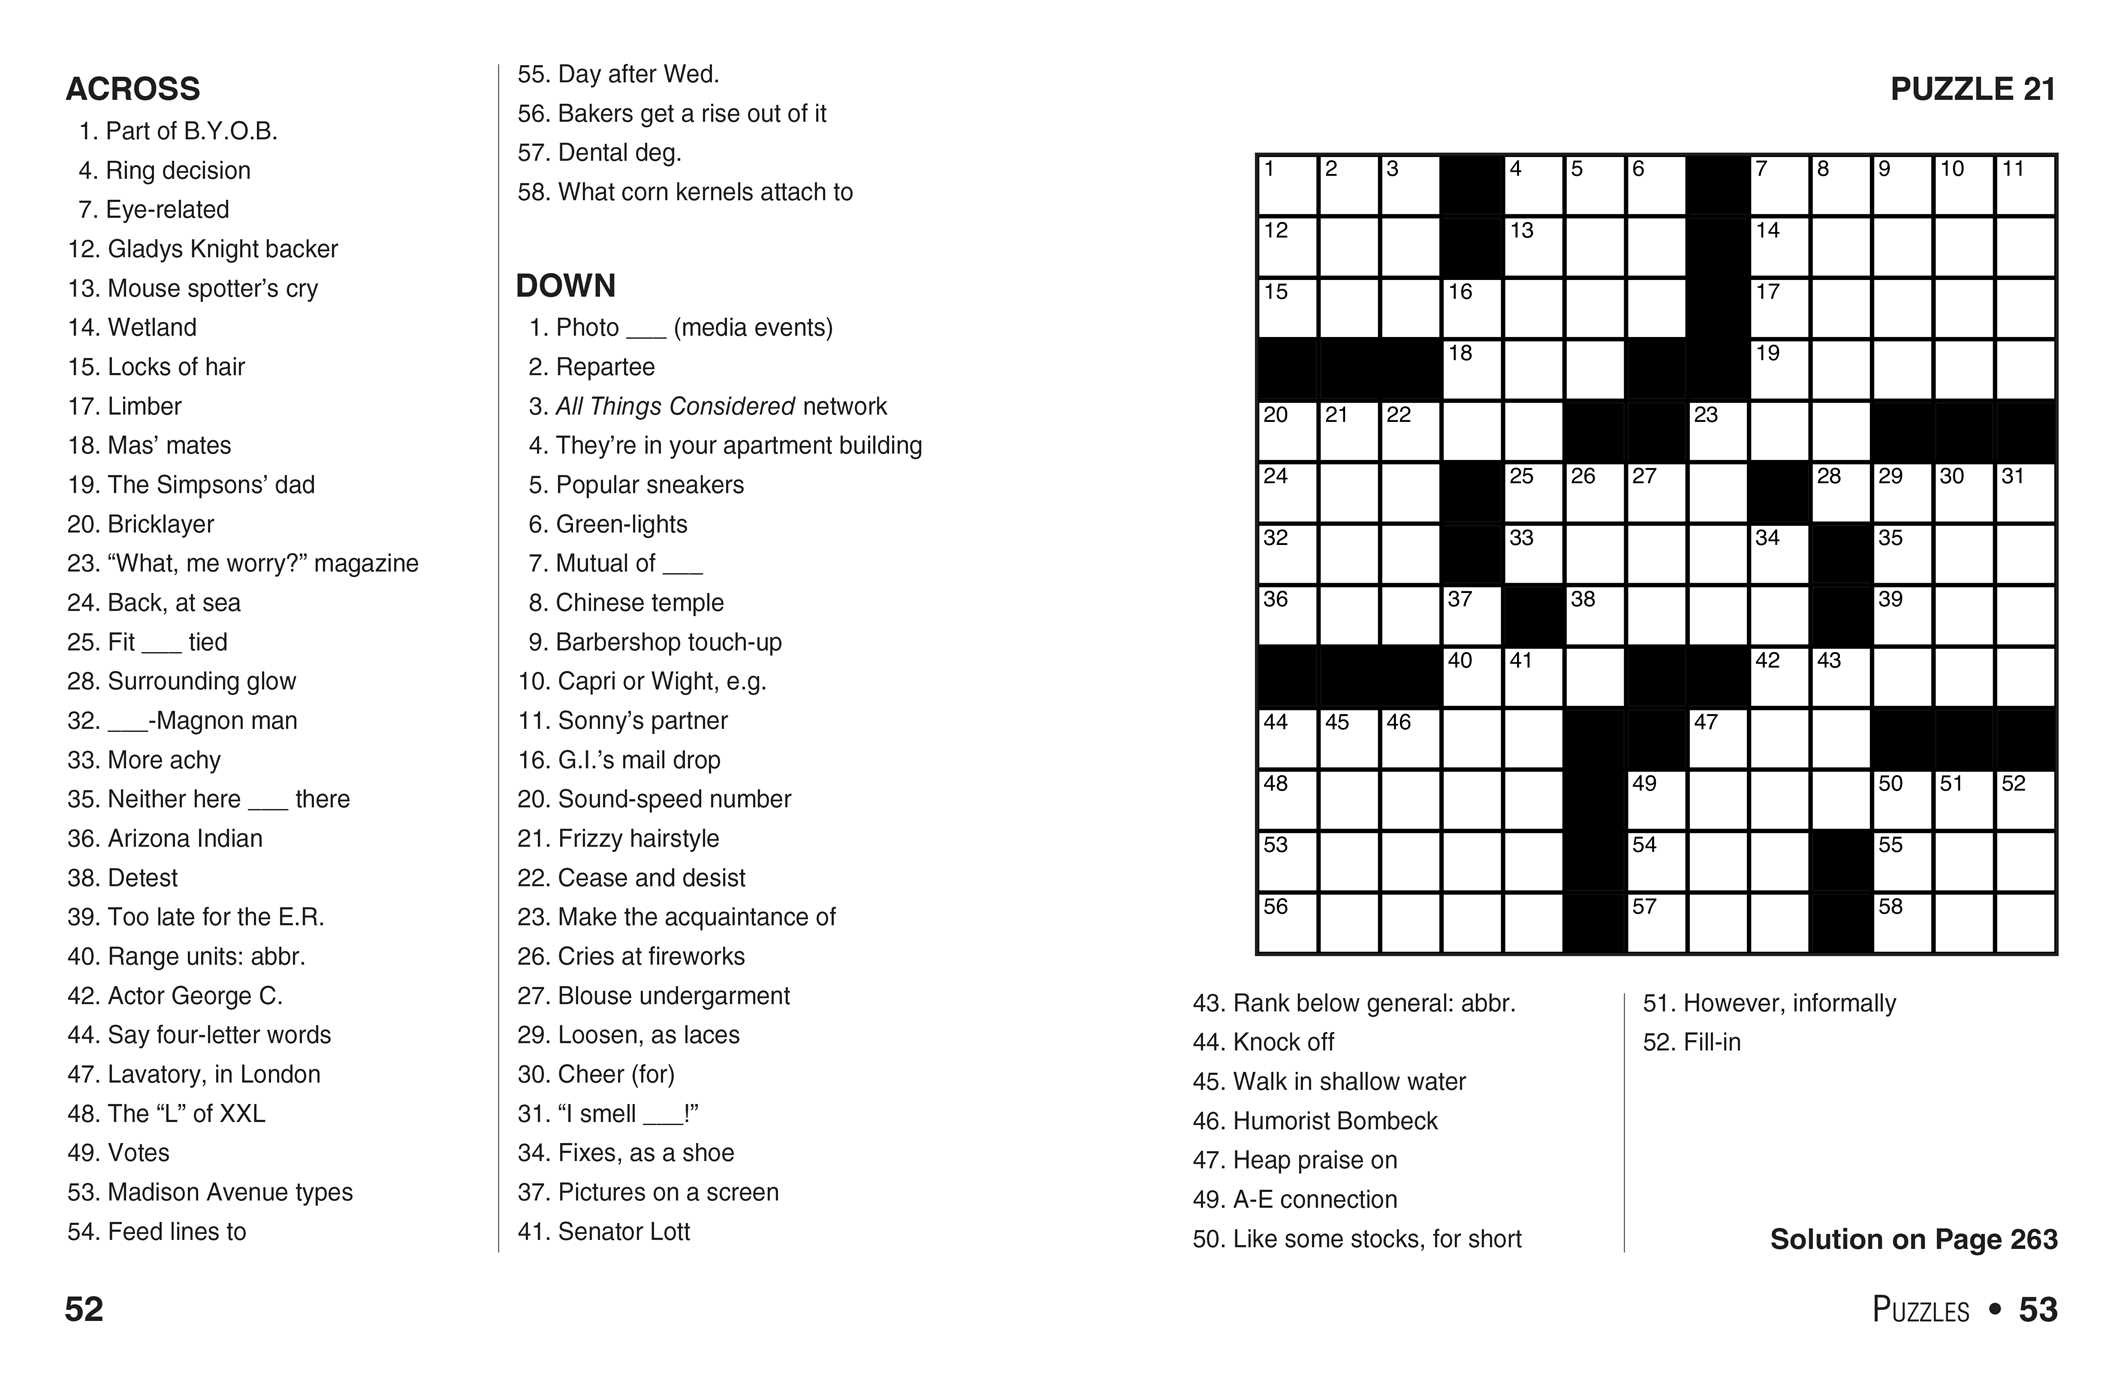 Coloring ~ Dollar Tree Large Print Crossword Puzzle Books For Sale - Large Print Crossword Puzzle Books For Seniors